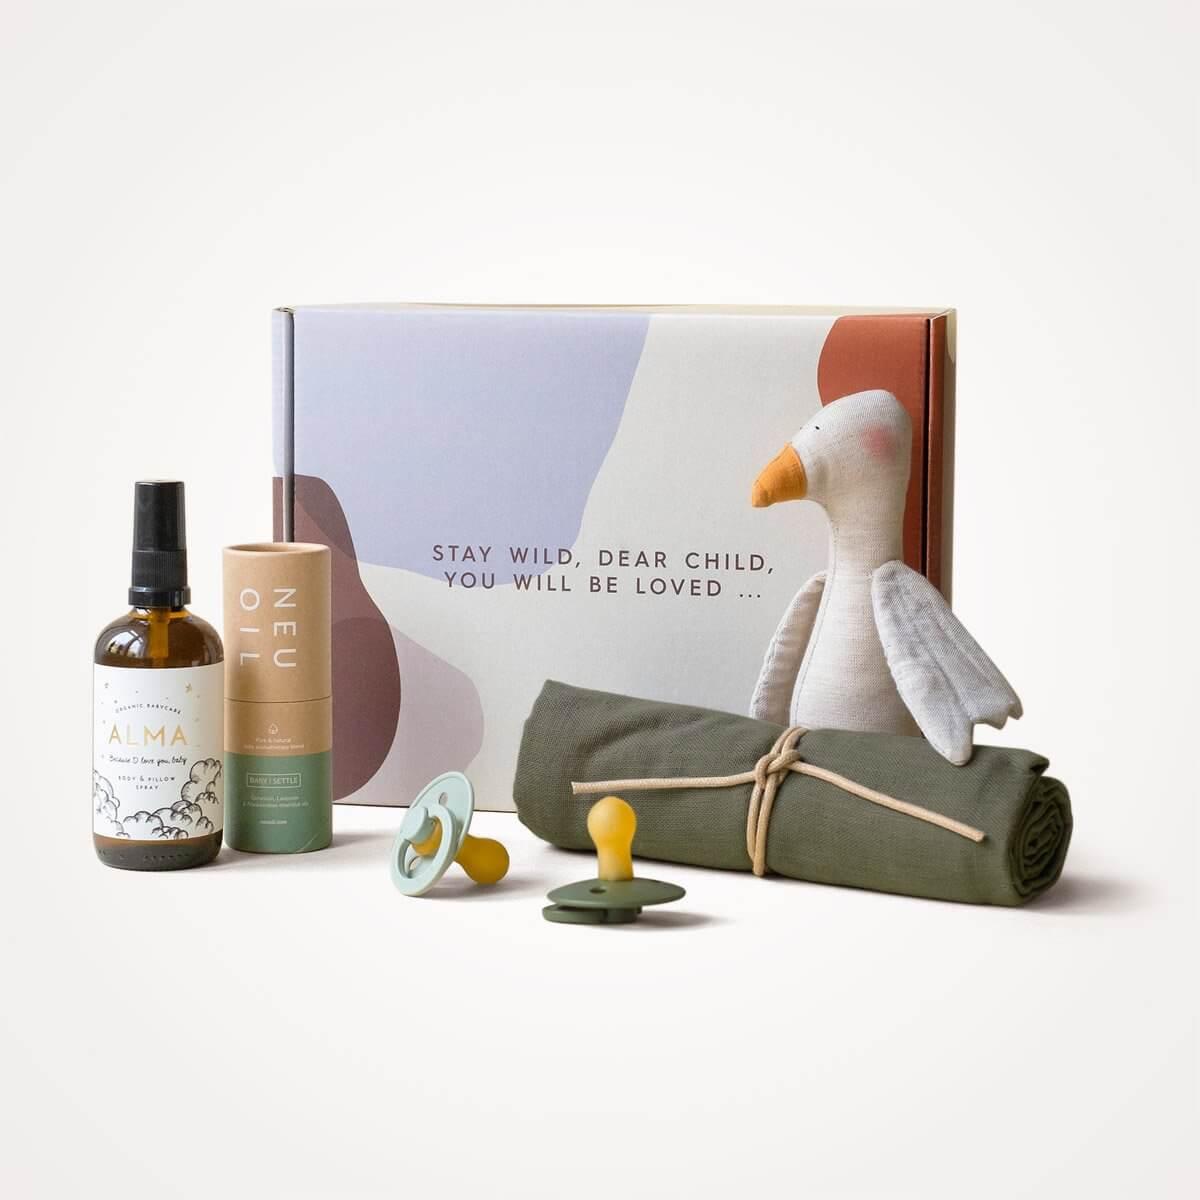 Offre et packaging pour enfant de Beloved Shop